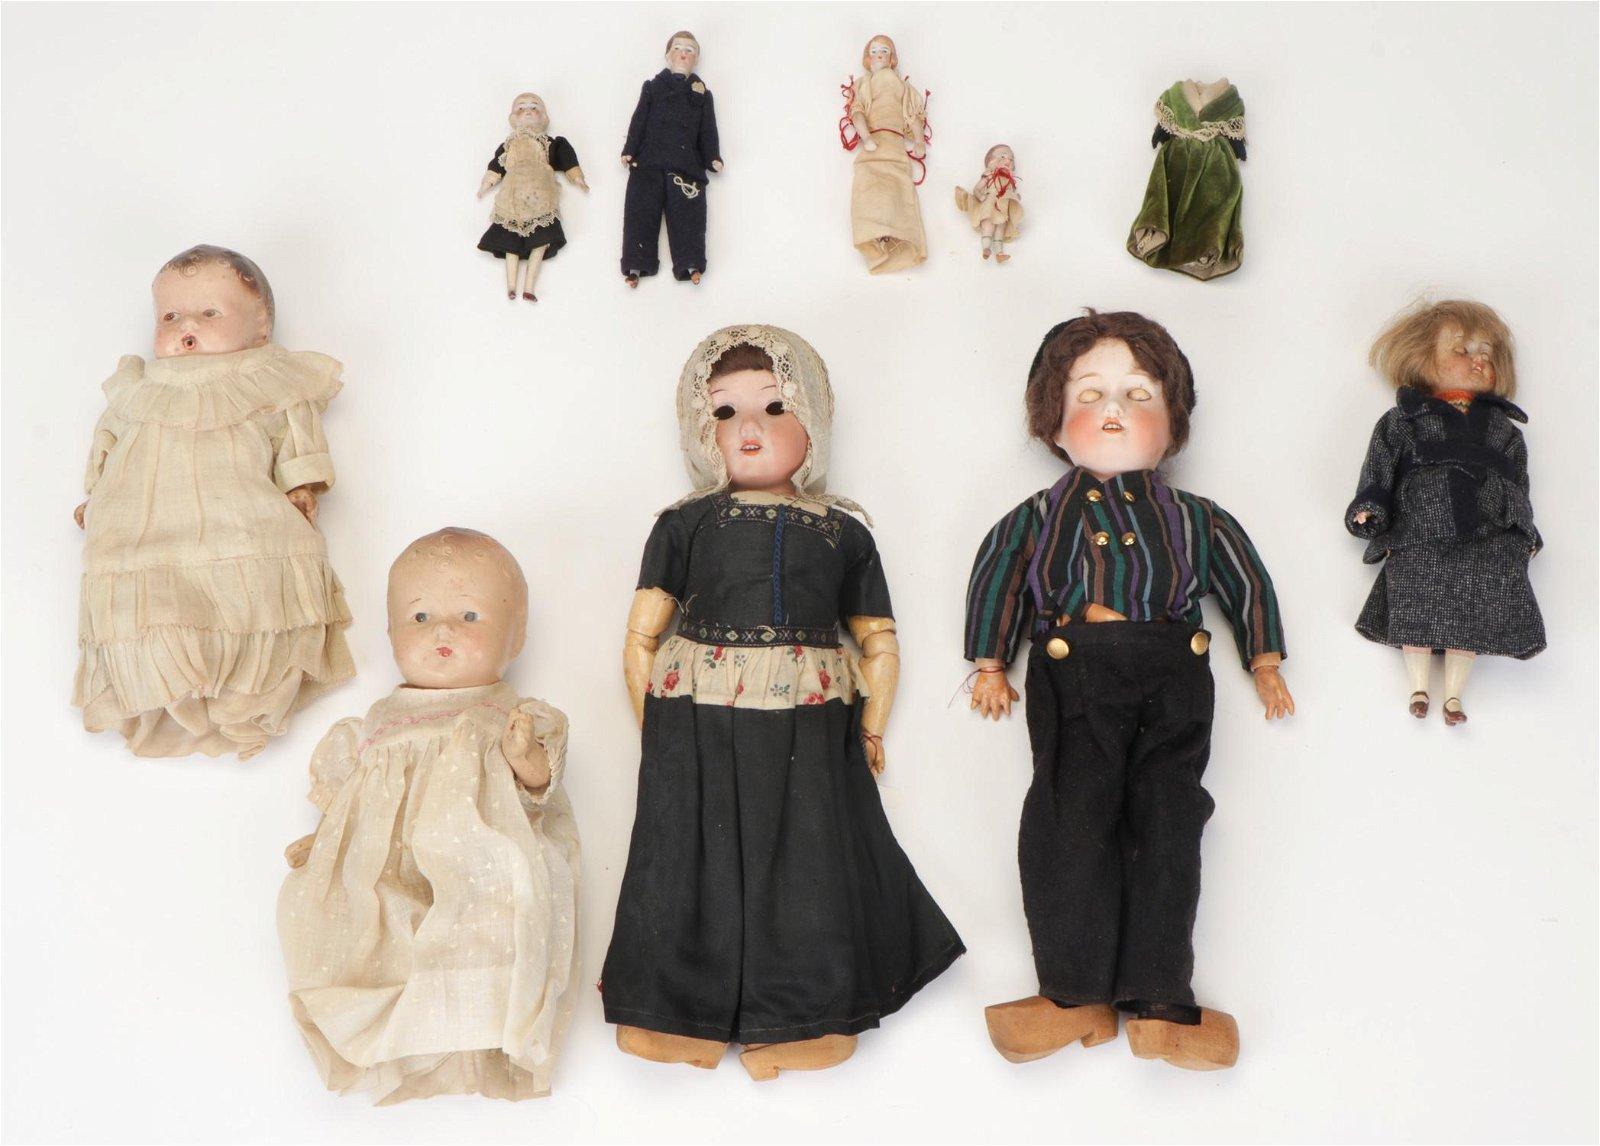 Group of  10 Vintage Dolls